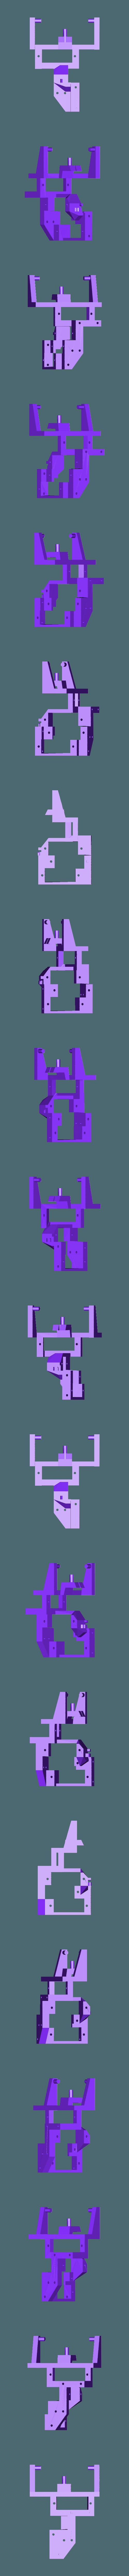 Base_New.stl Download free STL file Animatronic eyes • 3D printer template, robolab19